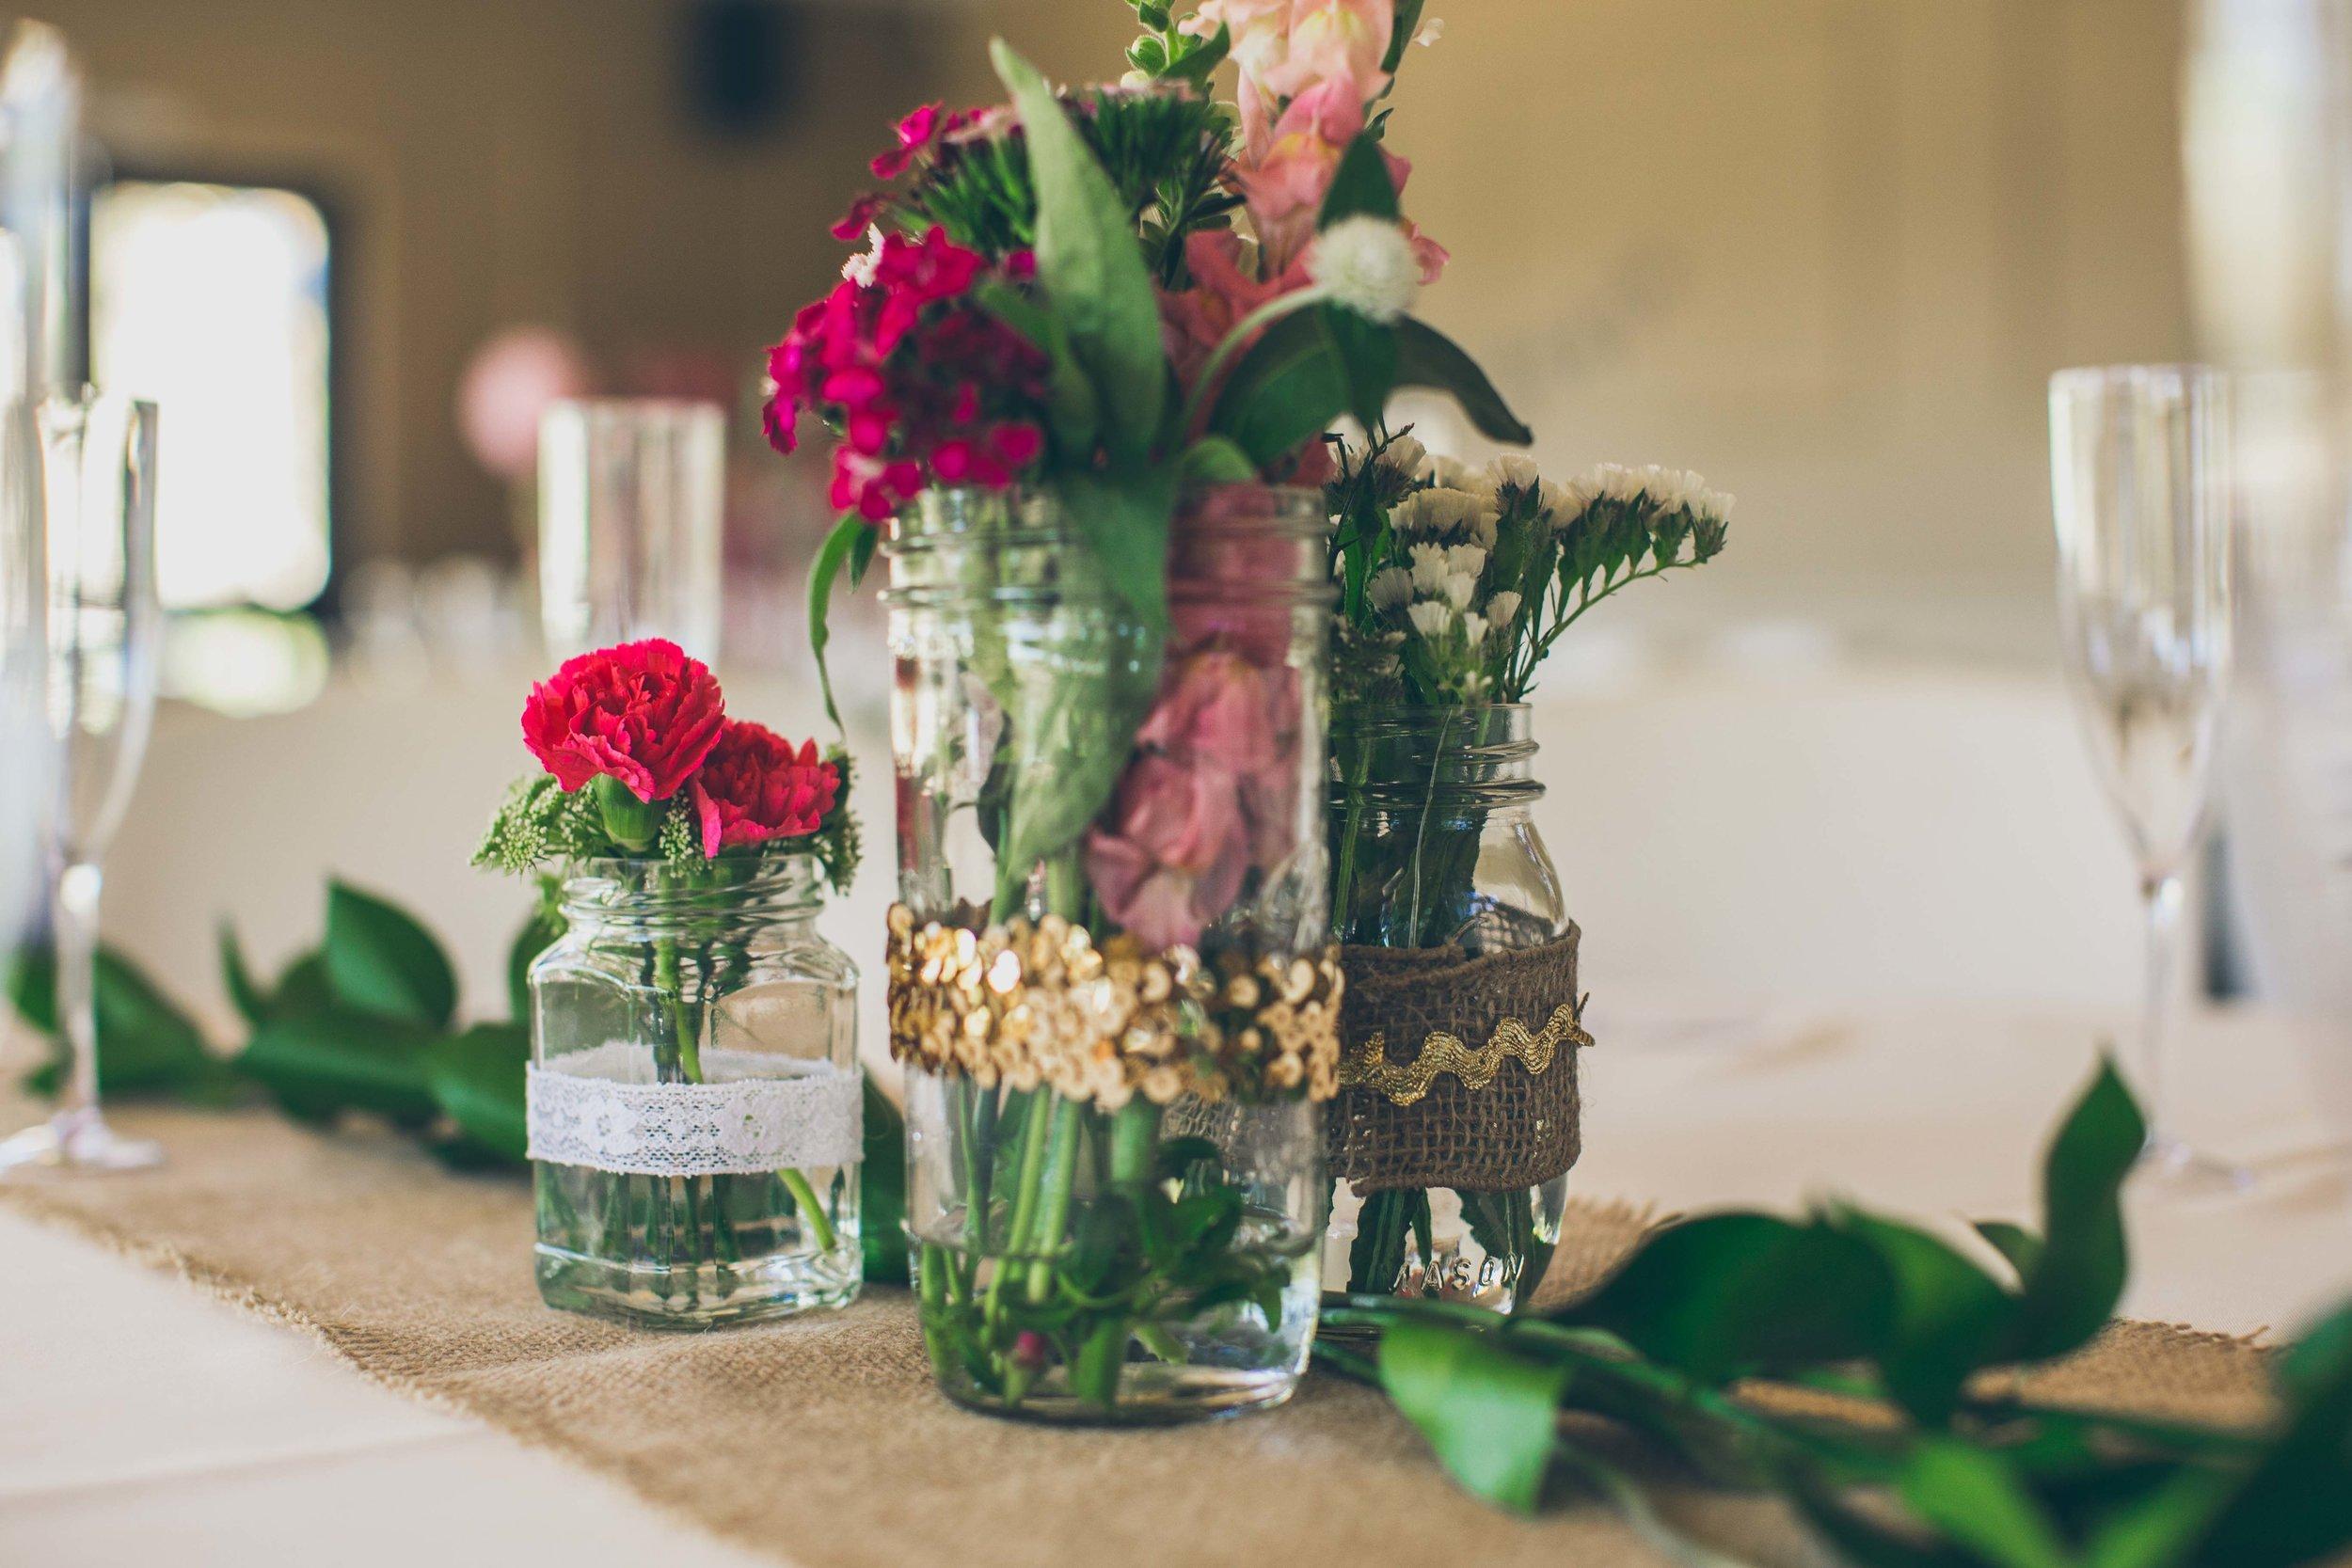 20141024-DePartee-Wedding-APavone-014-sm.jpg